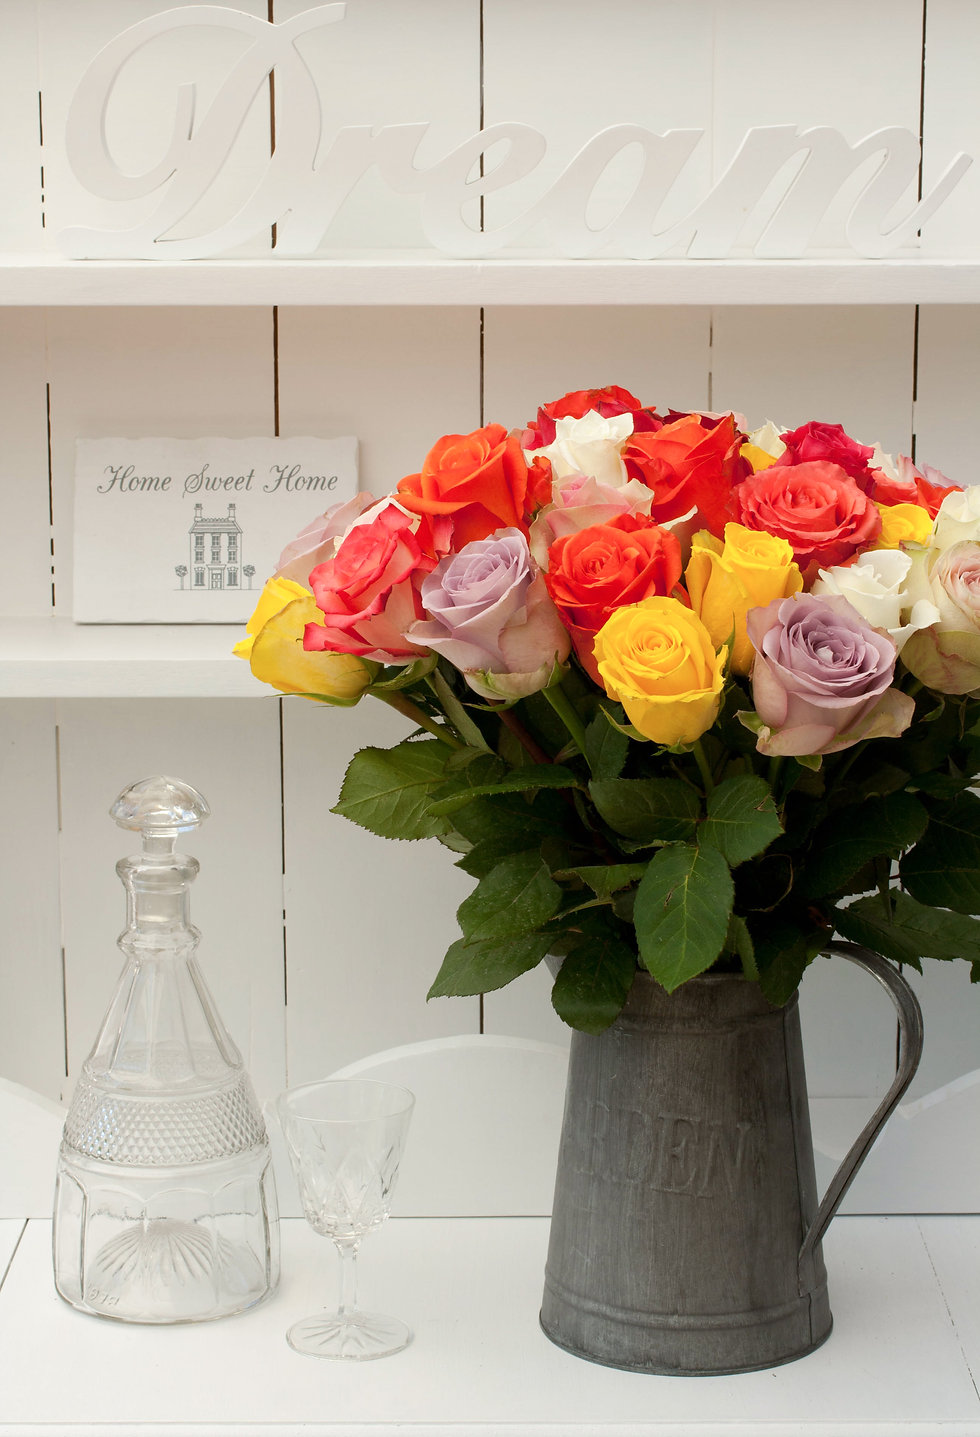 Flower delivery Web shop